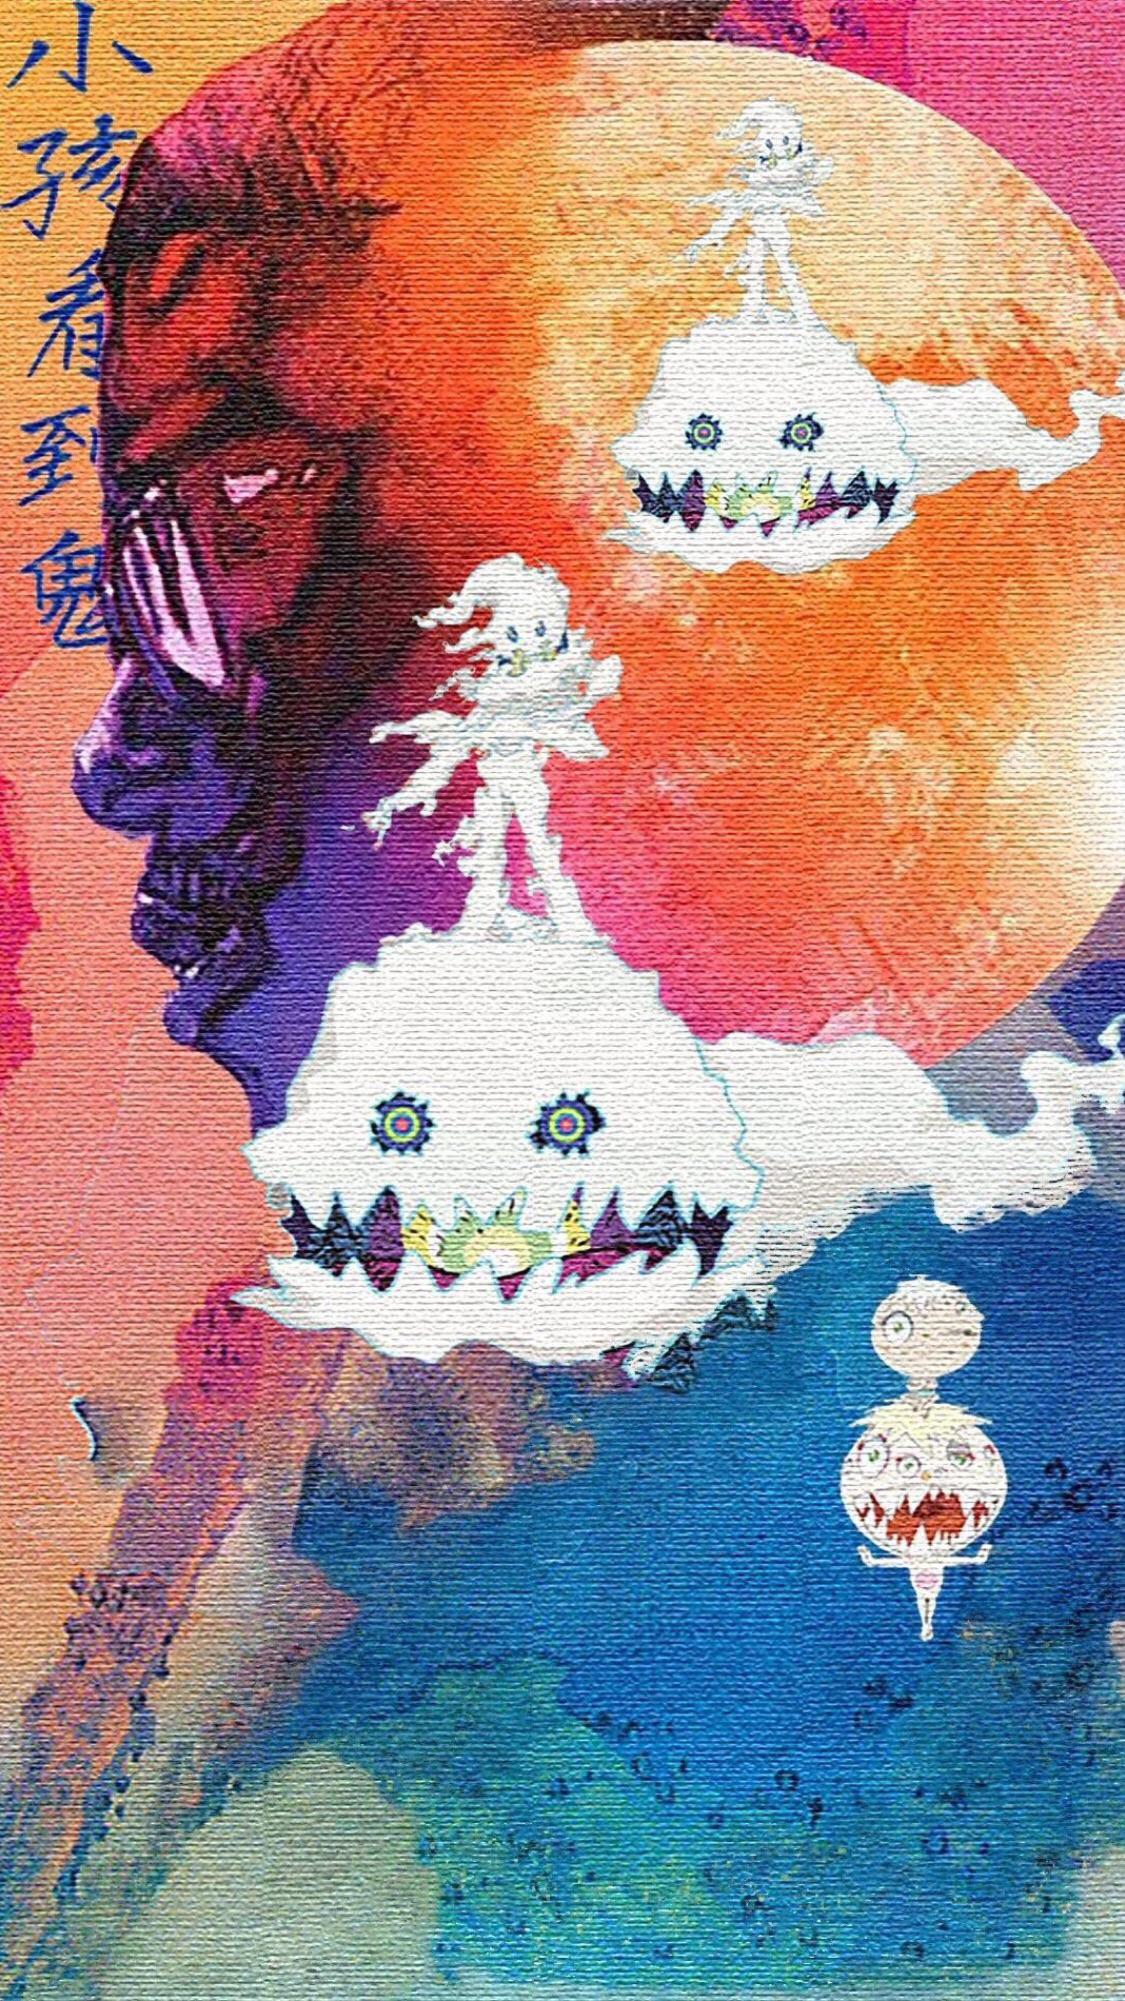 Pin By Bridget Chase On Wallpapers Kid Cudi Wallpaper Hip Hop Art Flower Iphone Wallpaper